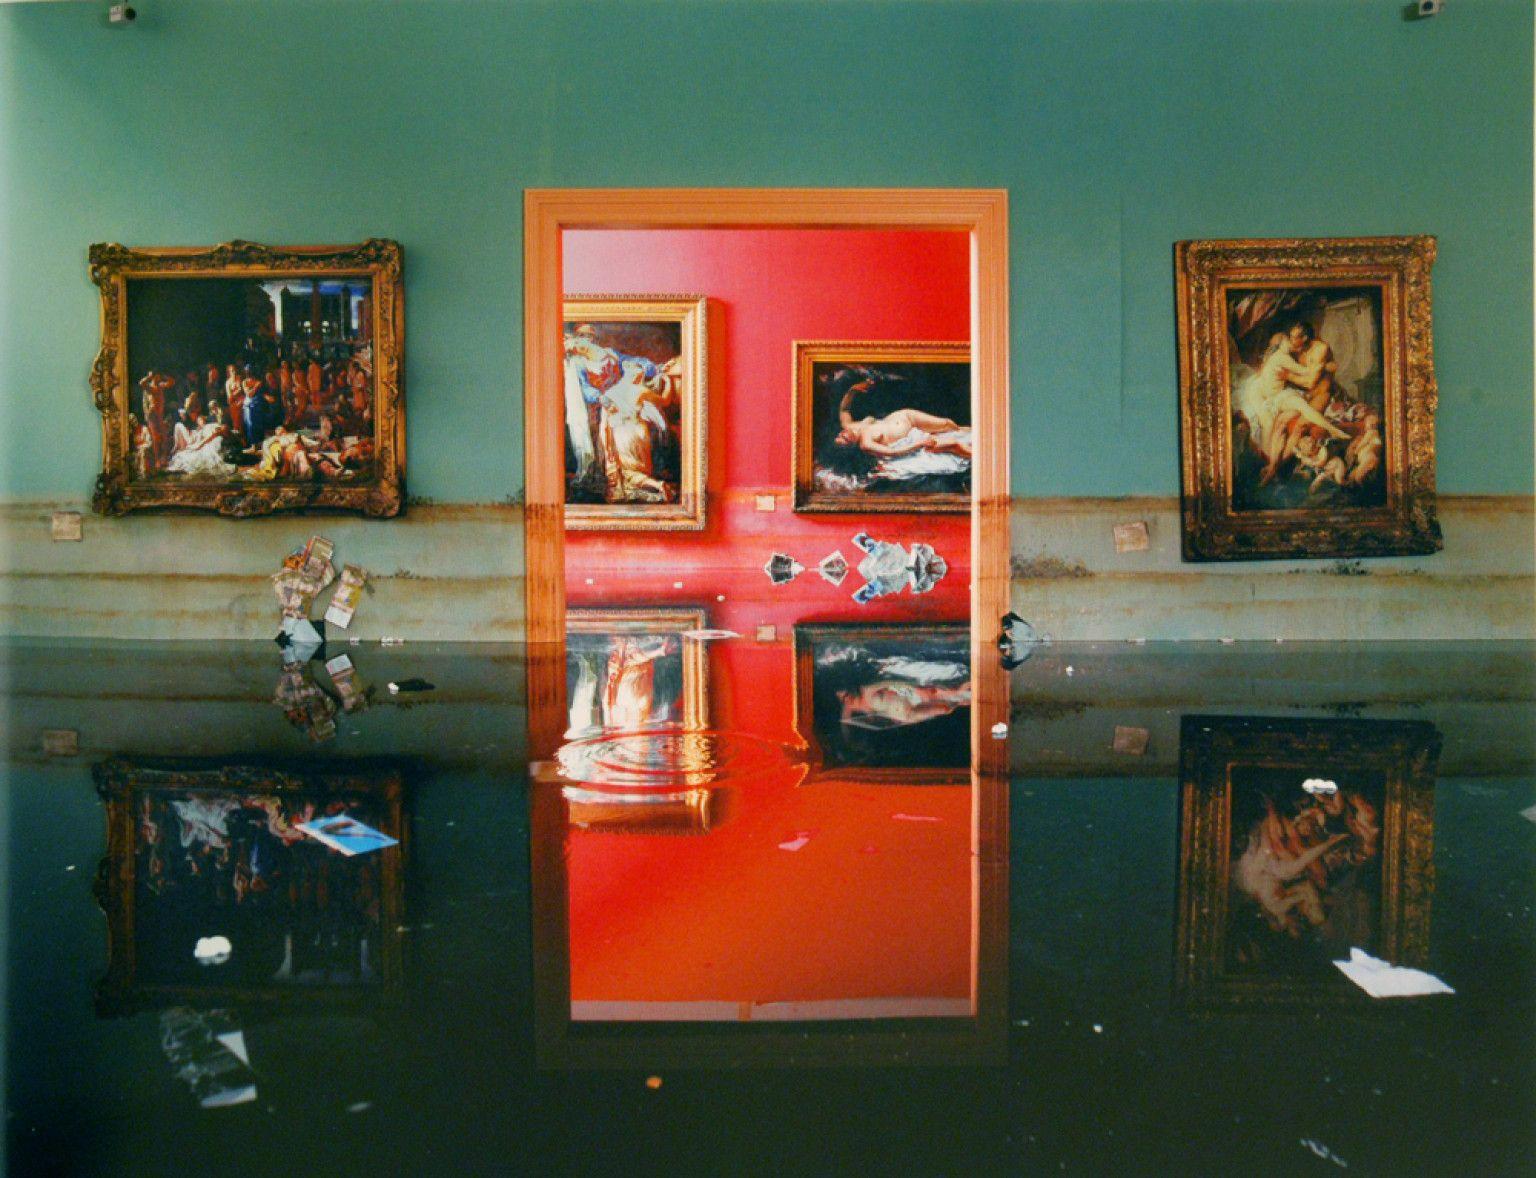 Museum, David LaChapelle, 2007.